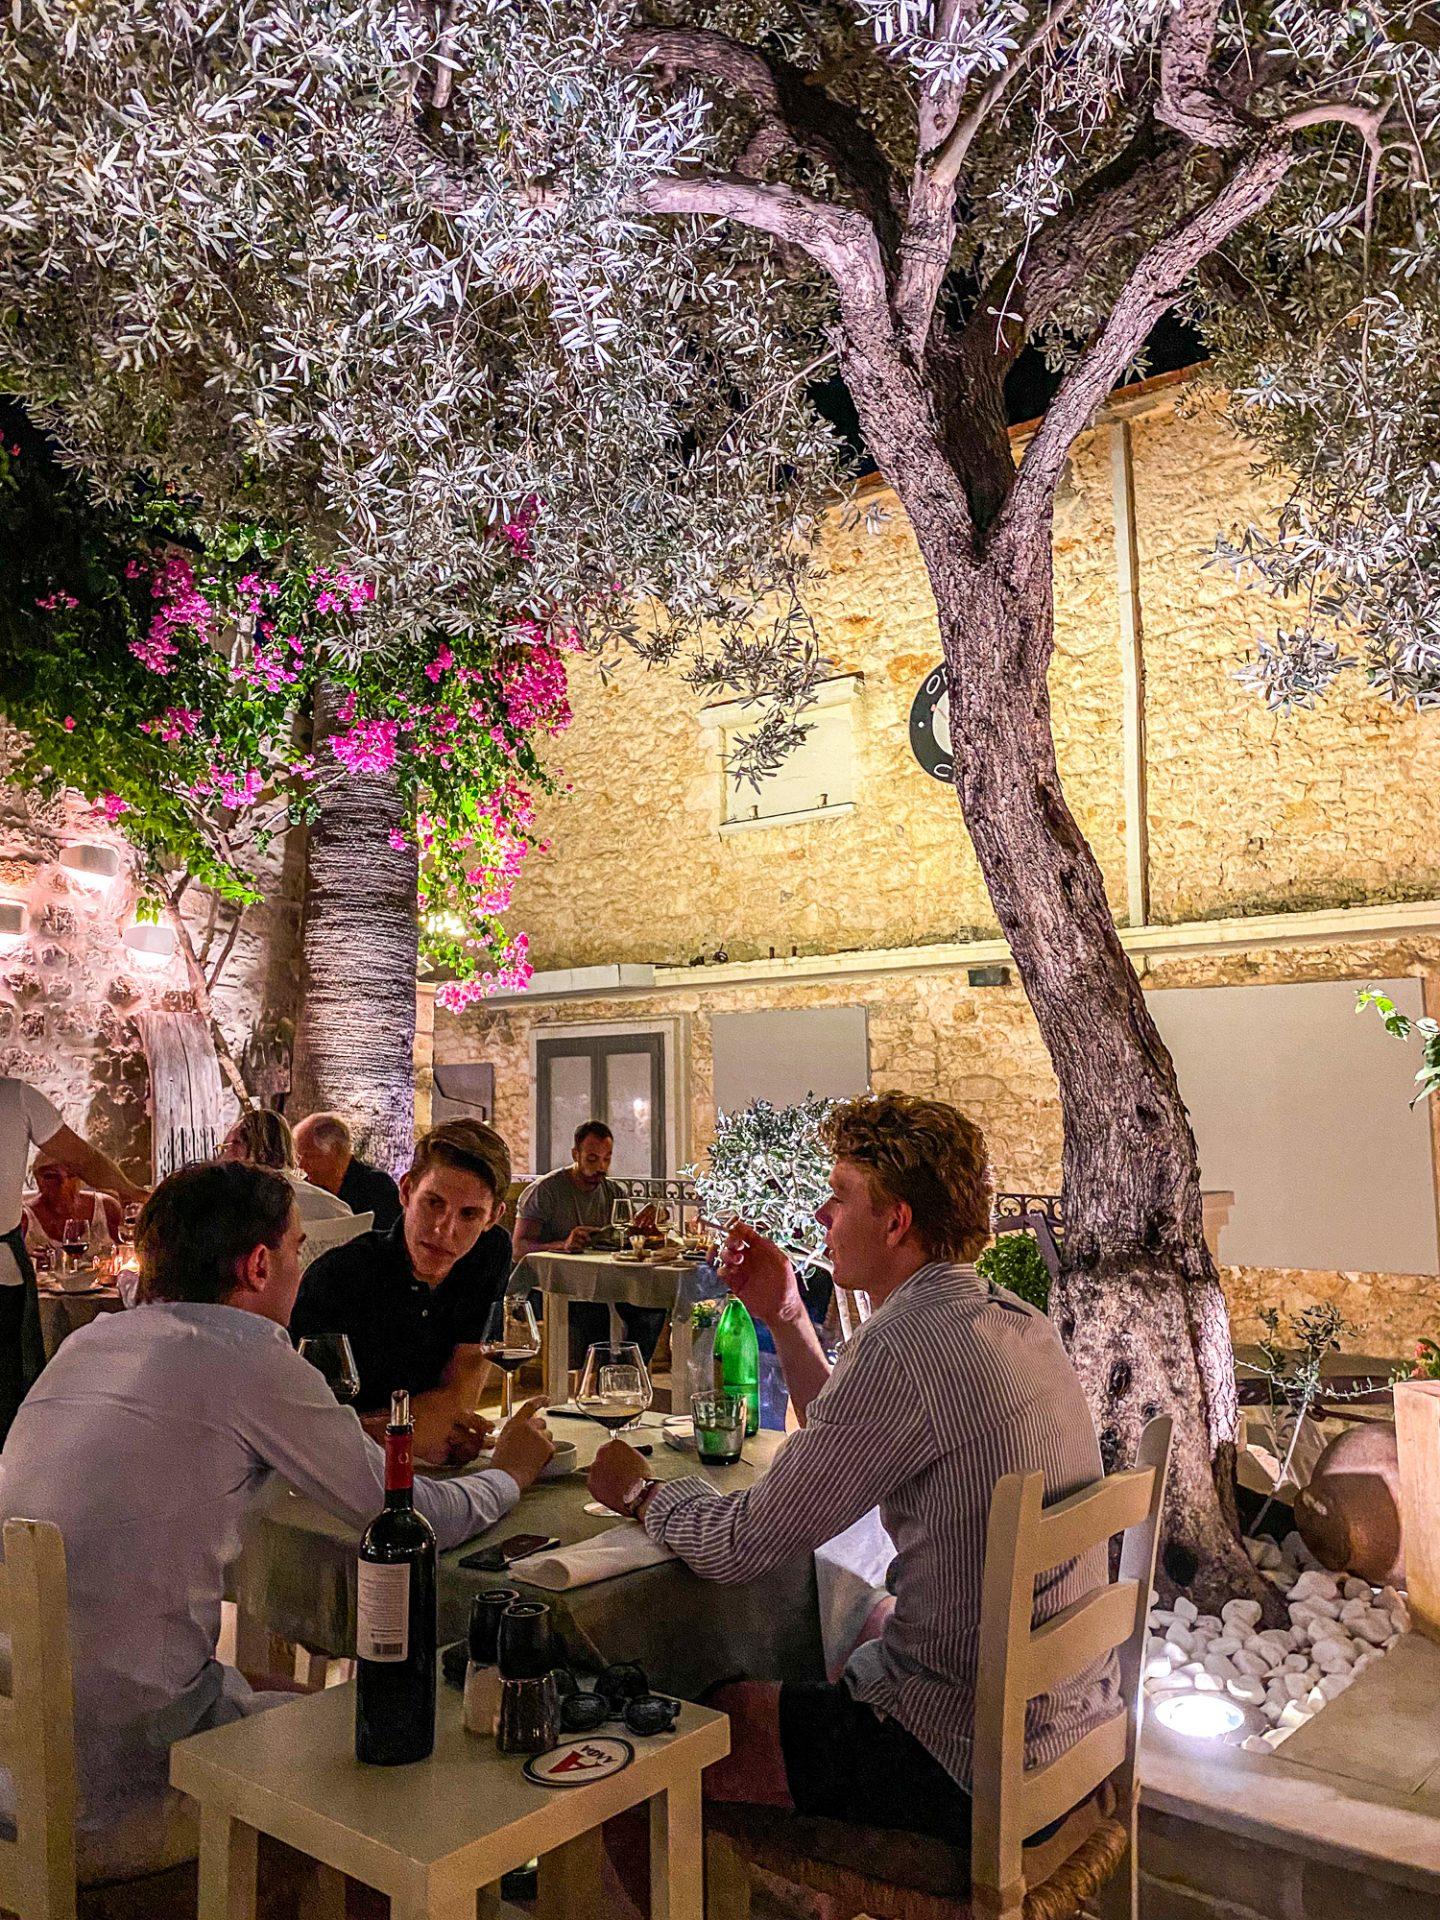 alana rethymno restaurant crete food greece